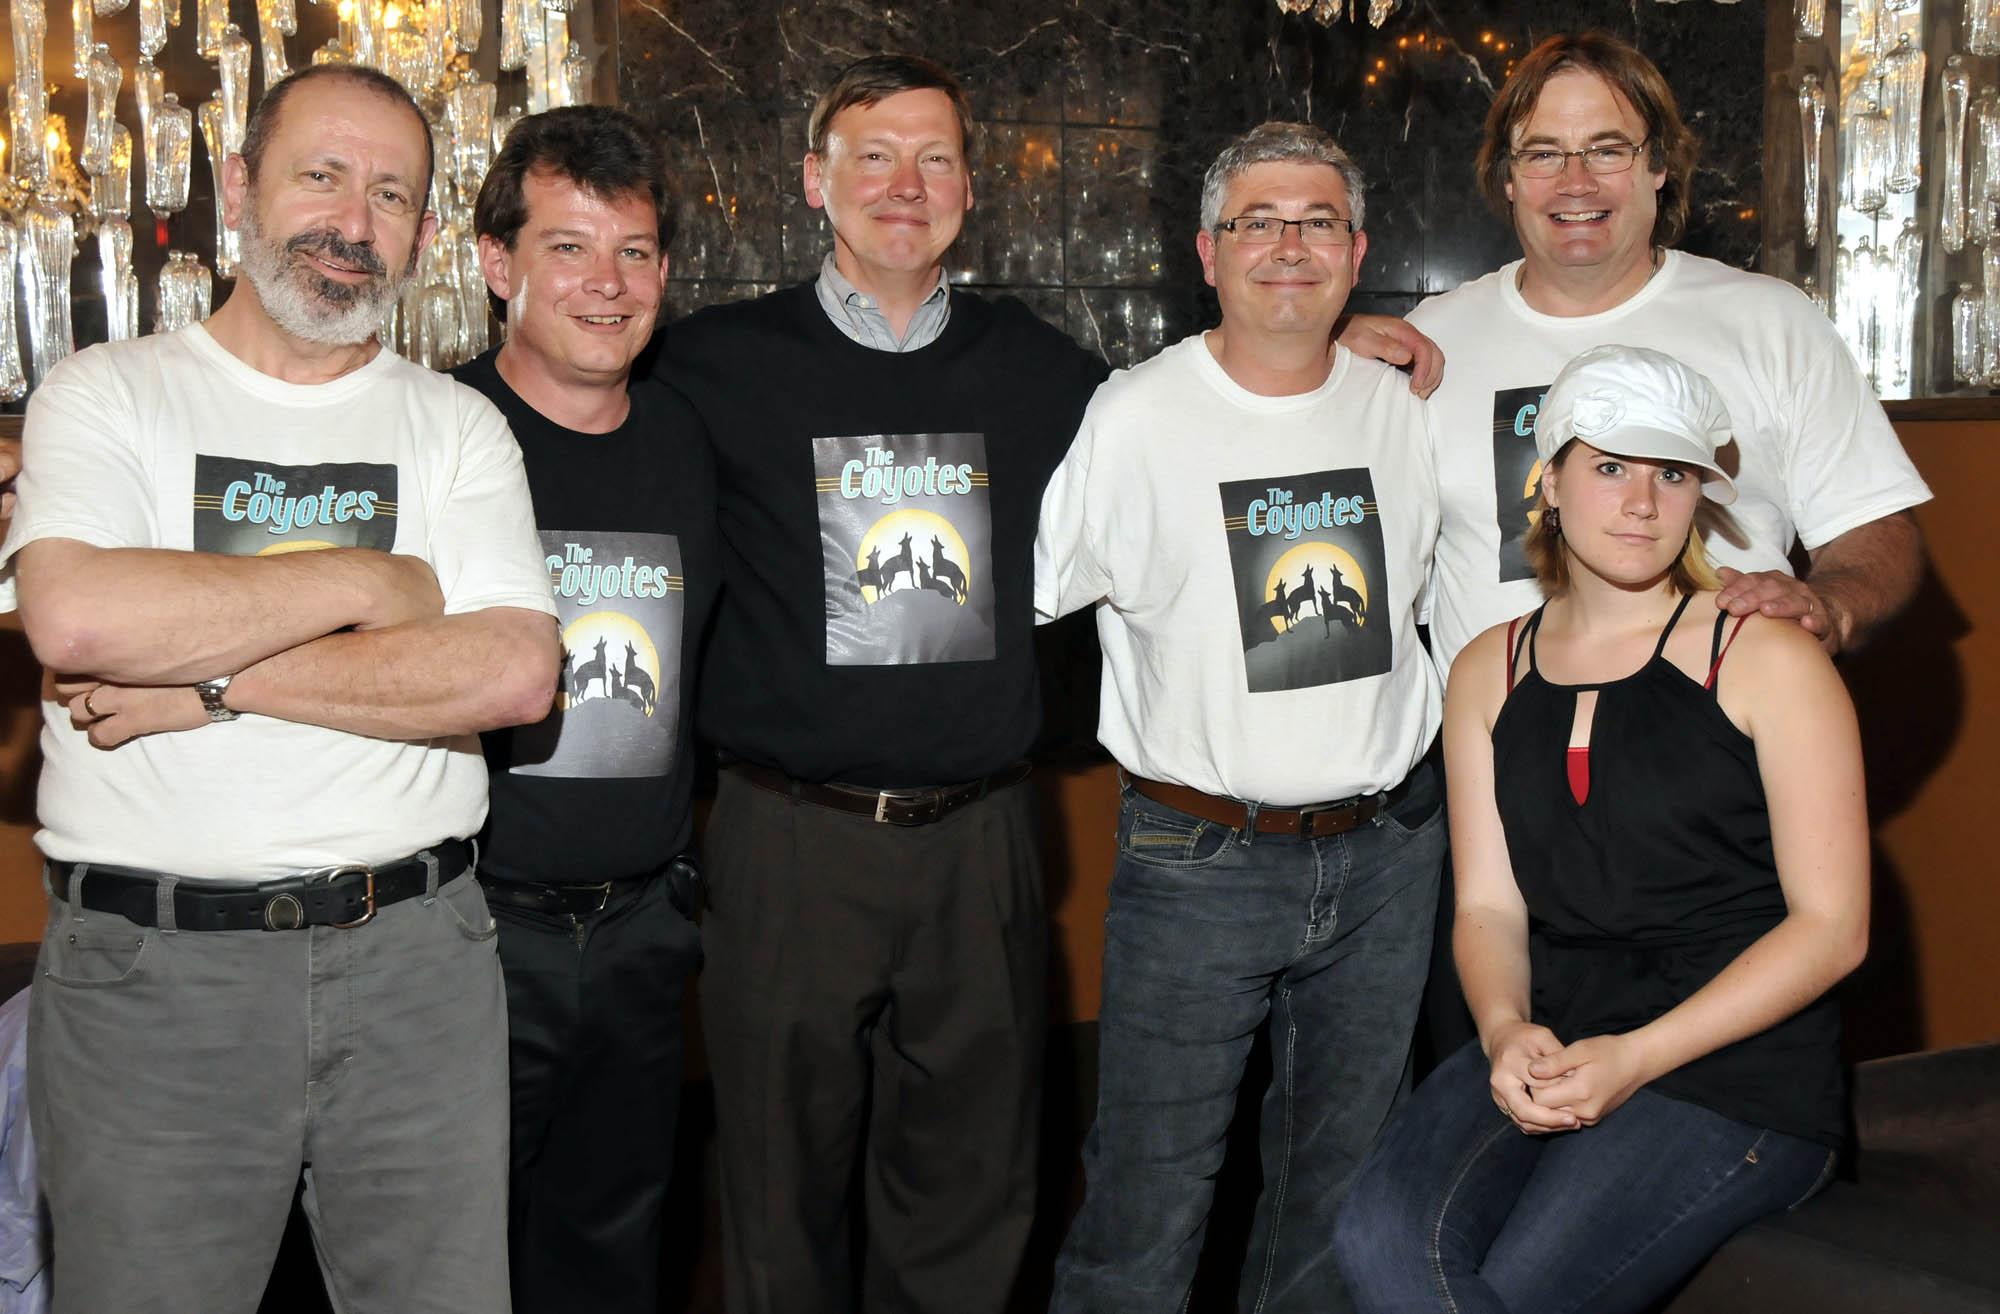 Peter, Mark,Eric,Burke,Jim,Amelia posed picture